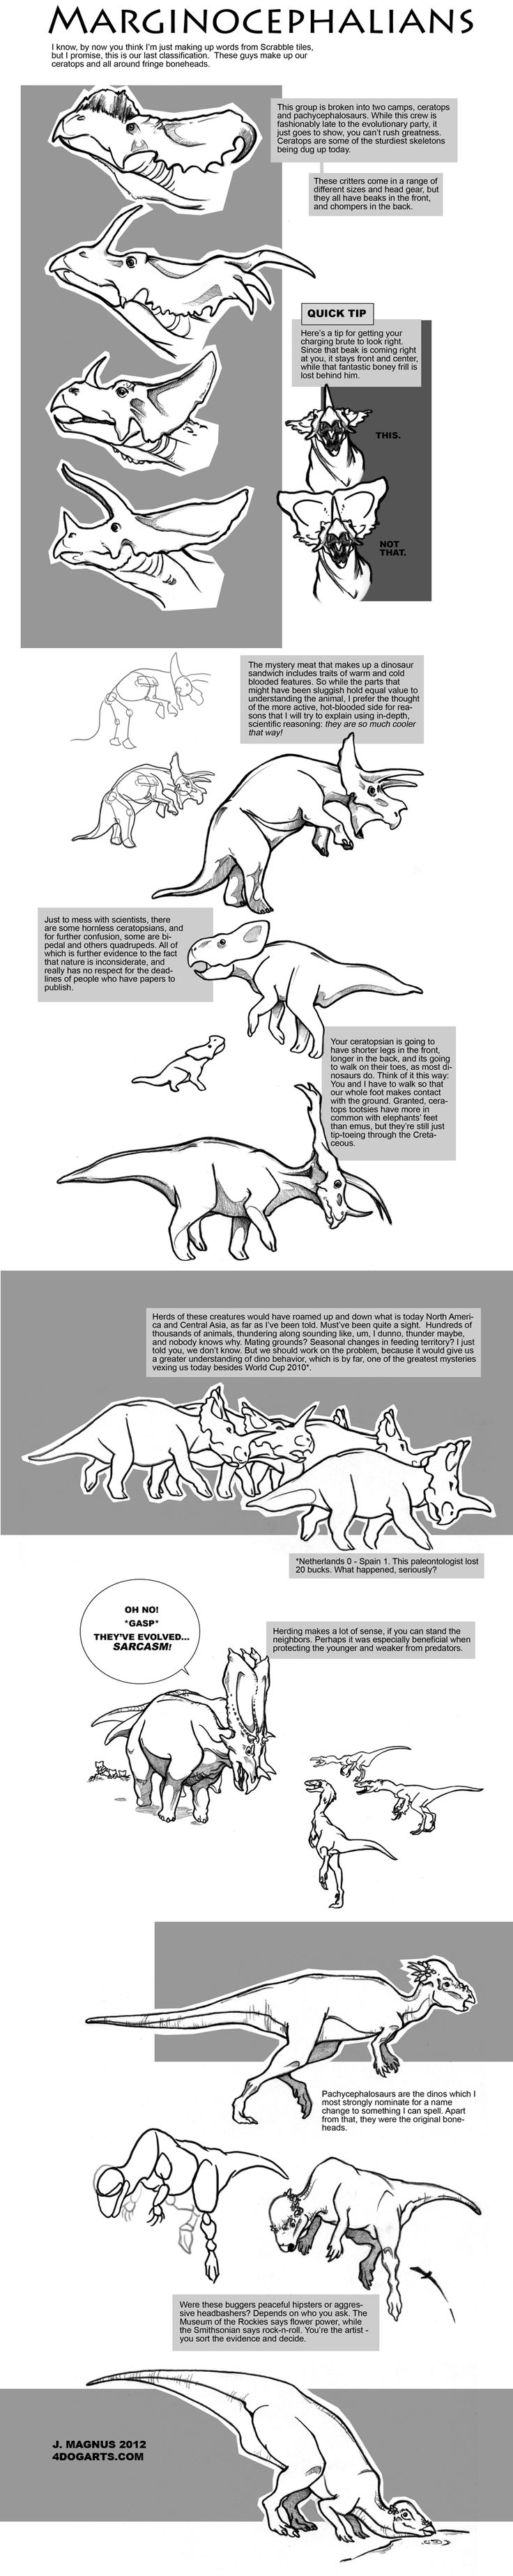 Marginocephalia Tutorial by sketcherjak on DeviantArt